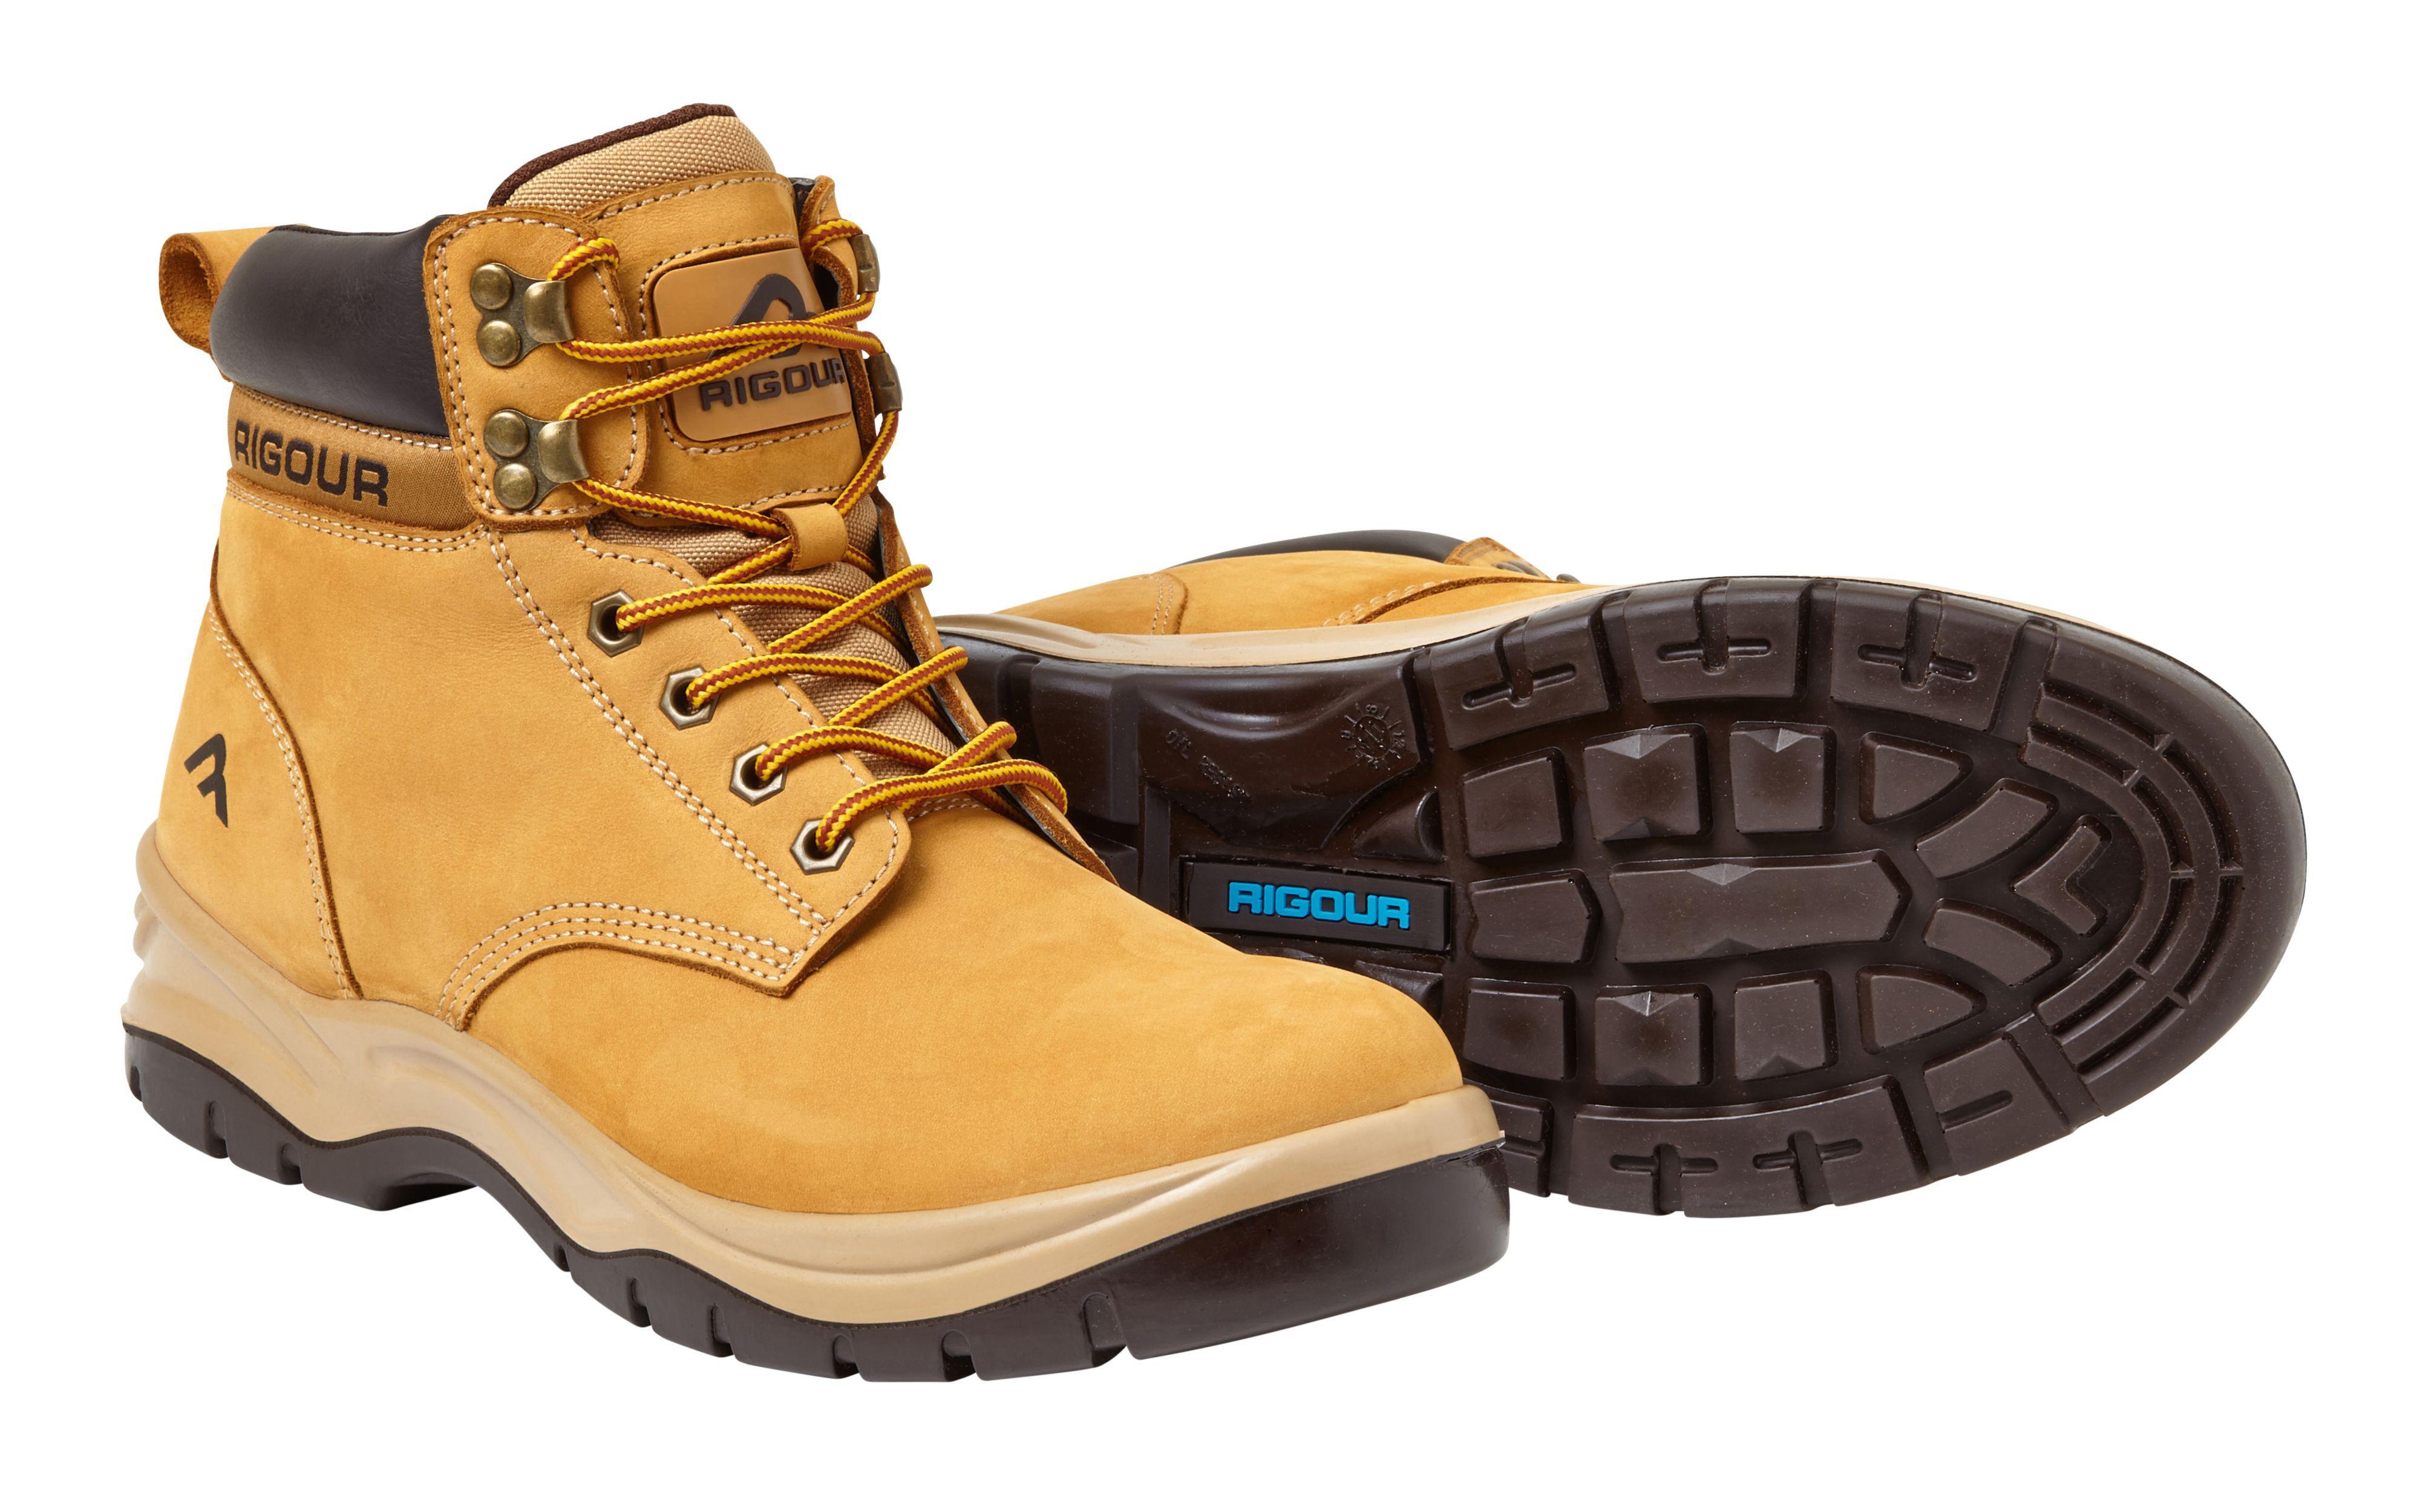 Rigour Wheat Safety Work Boots, Size 11